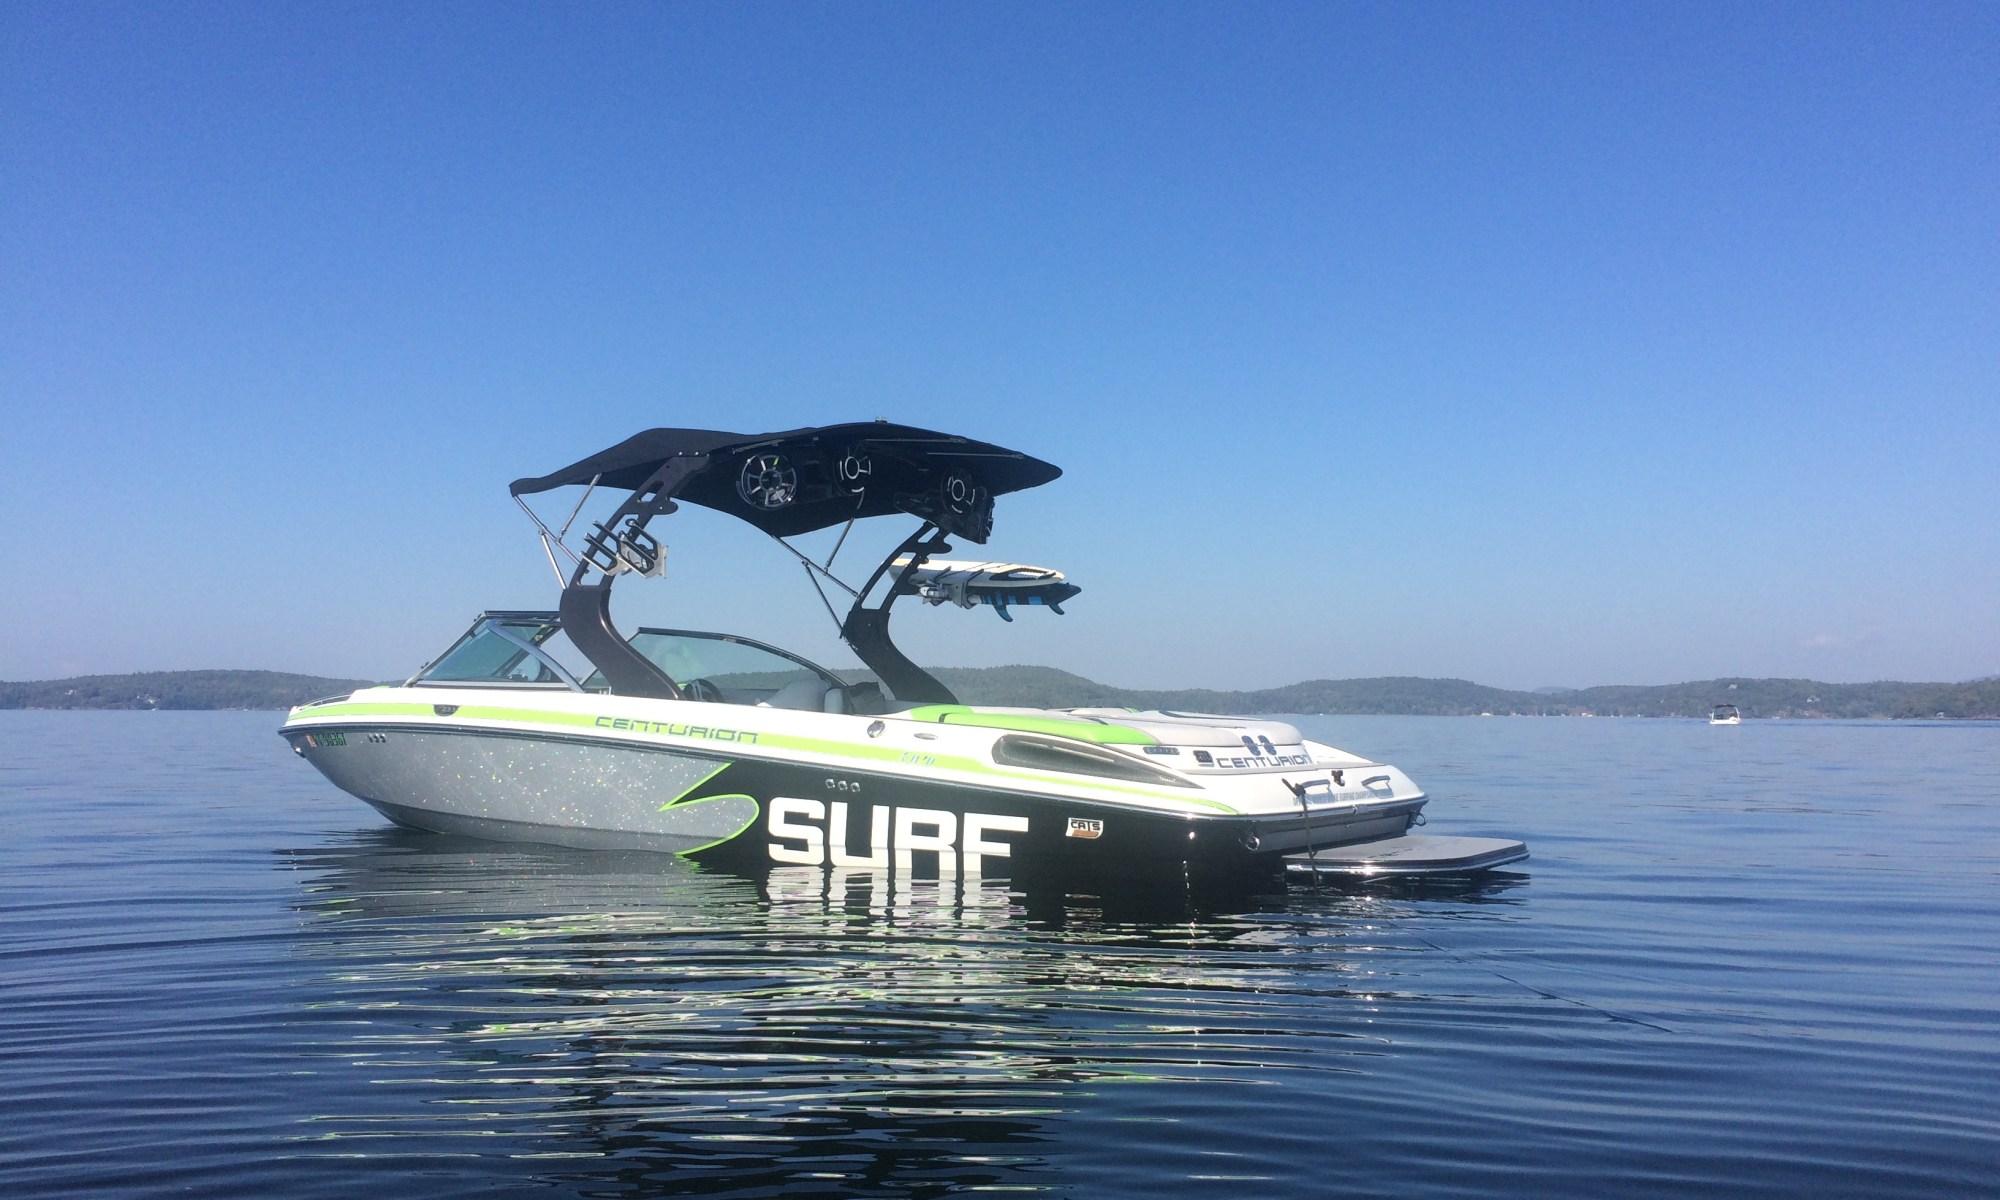 Centurion, Enzo, SV233, towboat, tournament, wakesurfing, lake champlain, wet sounds